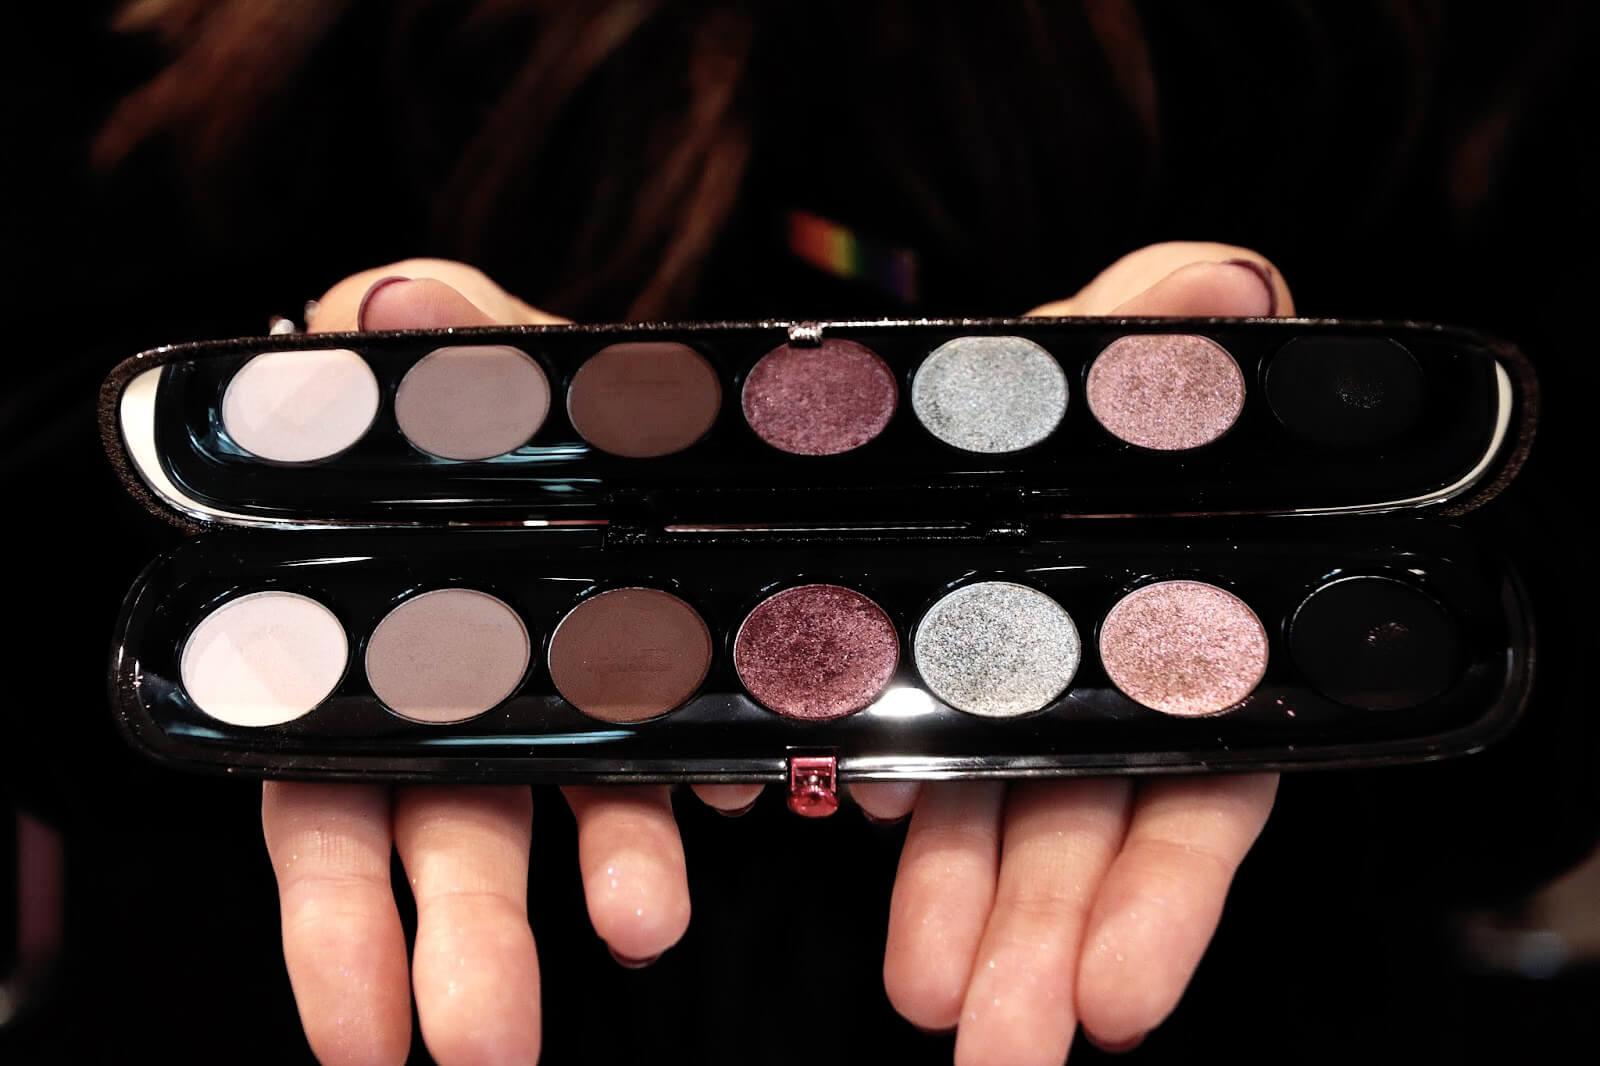 marc-jacobs-maquillage-automne-201ç-avis-palette-eye-conic-illuminateur-eyeliner-gel